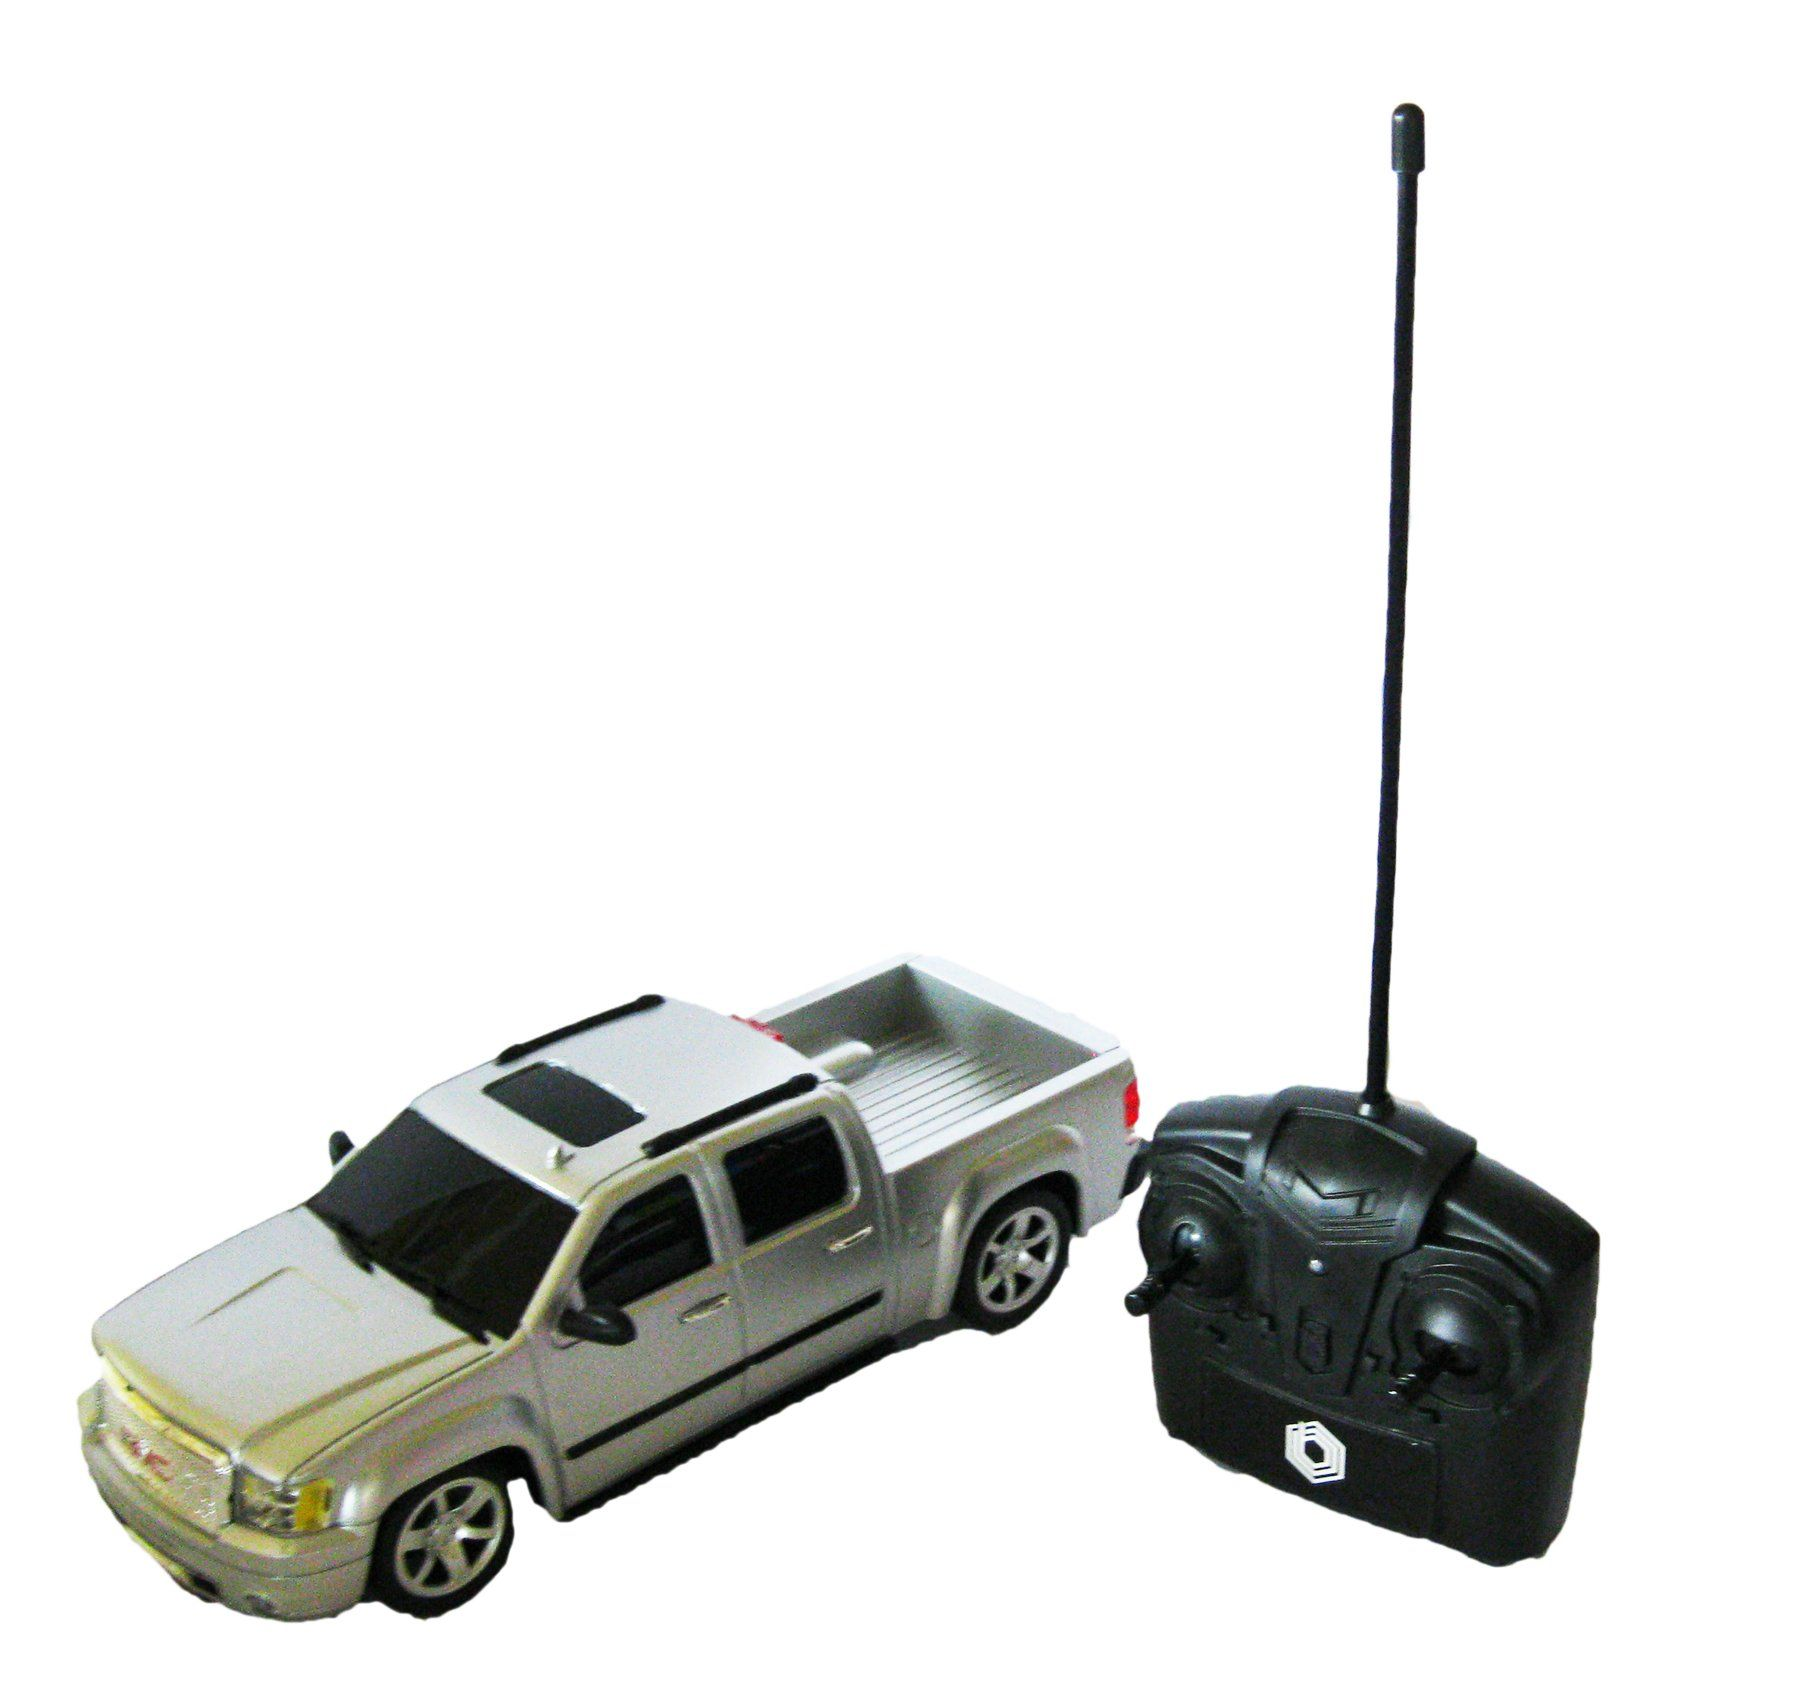 Officially Licensed Gmc Sierra Denali 1 24 Scale Full Function Radio Control Gk Racer Series Truck Silver Find Gmc Sierra Denali Sierra Denali Gmc Sierra